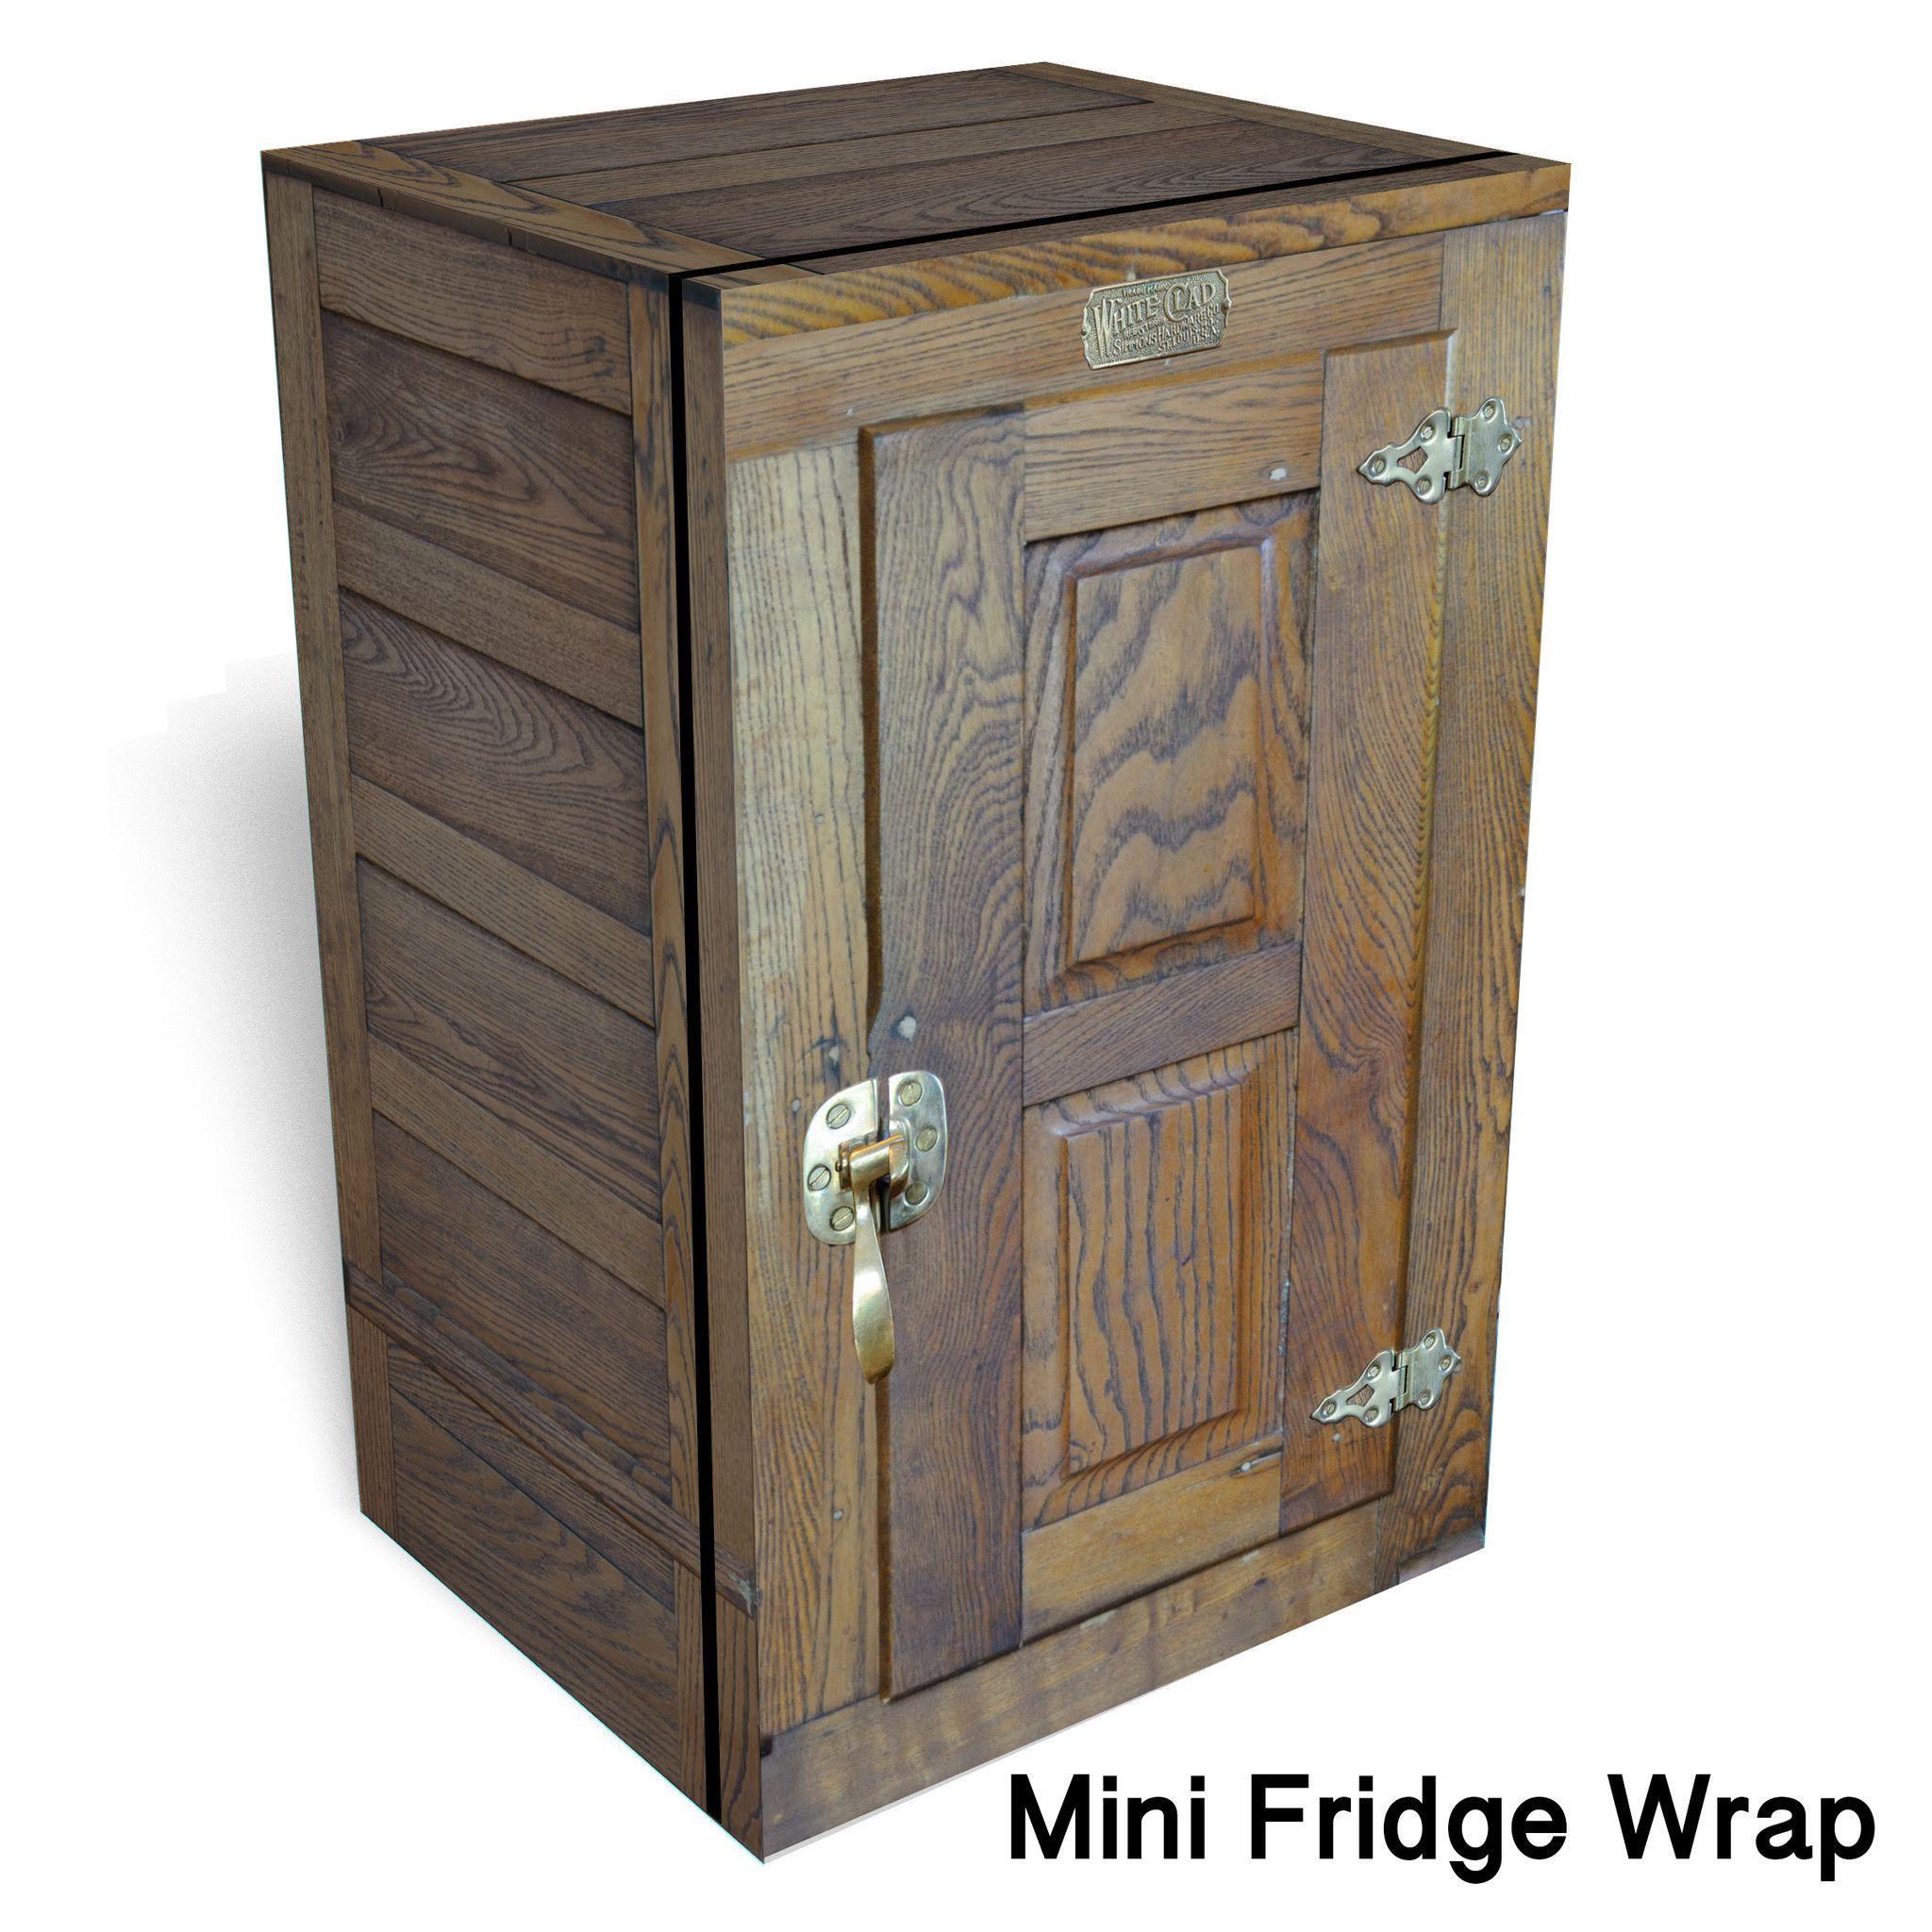 Icebox Mini Fridge Wrap Mini Fridge Mini Fridge Cabinet Fridge Makeover